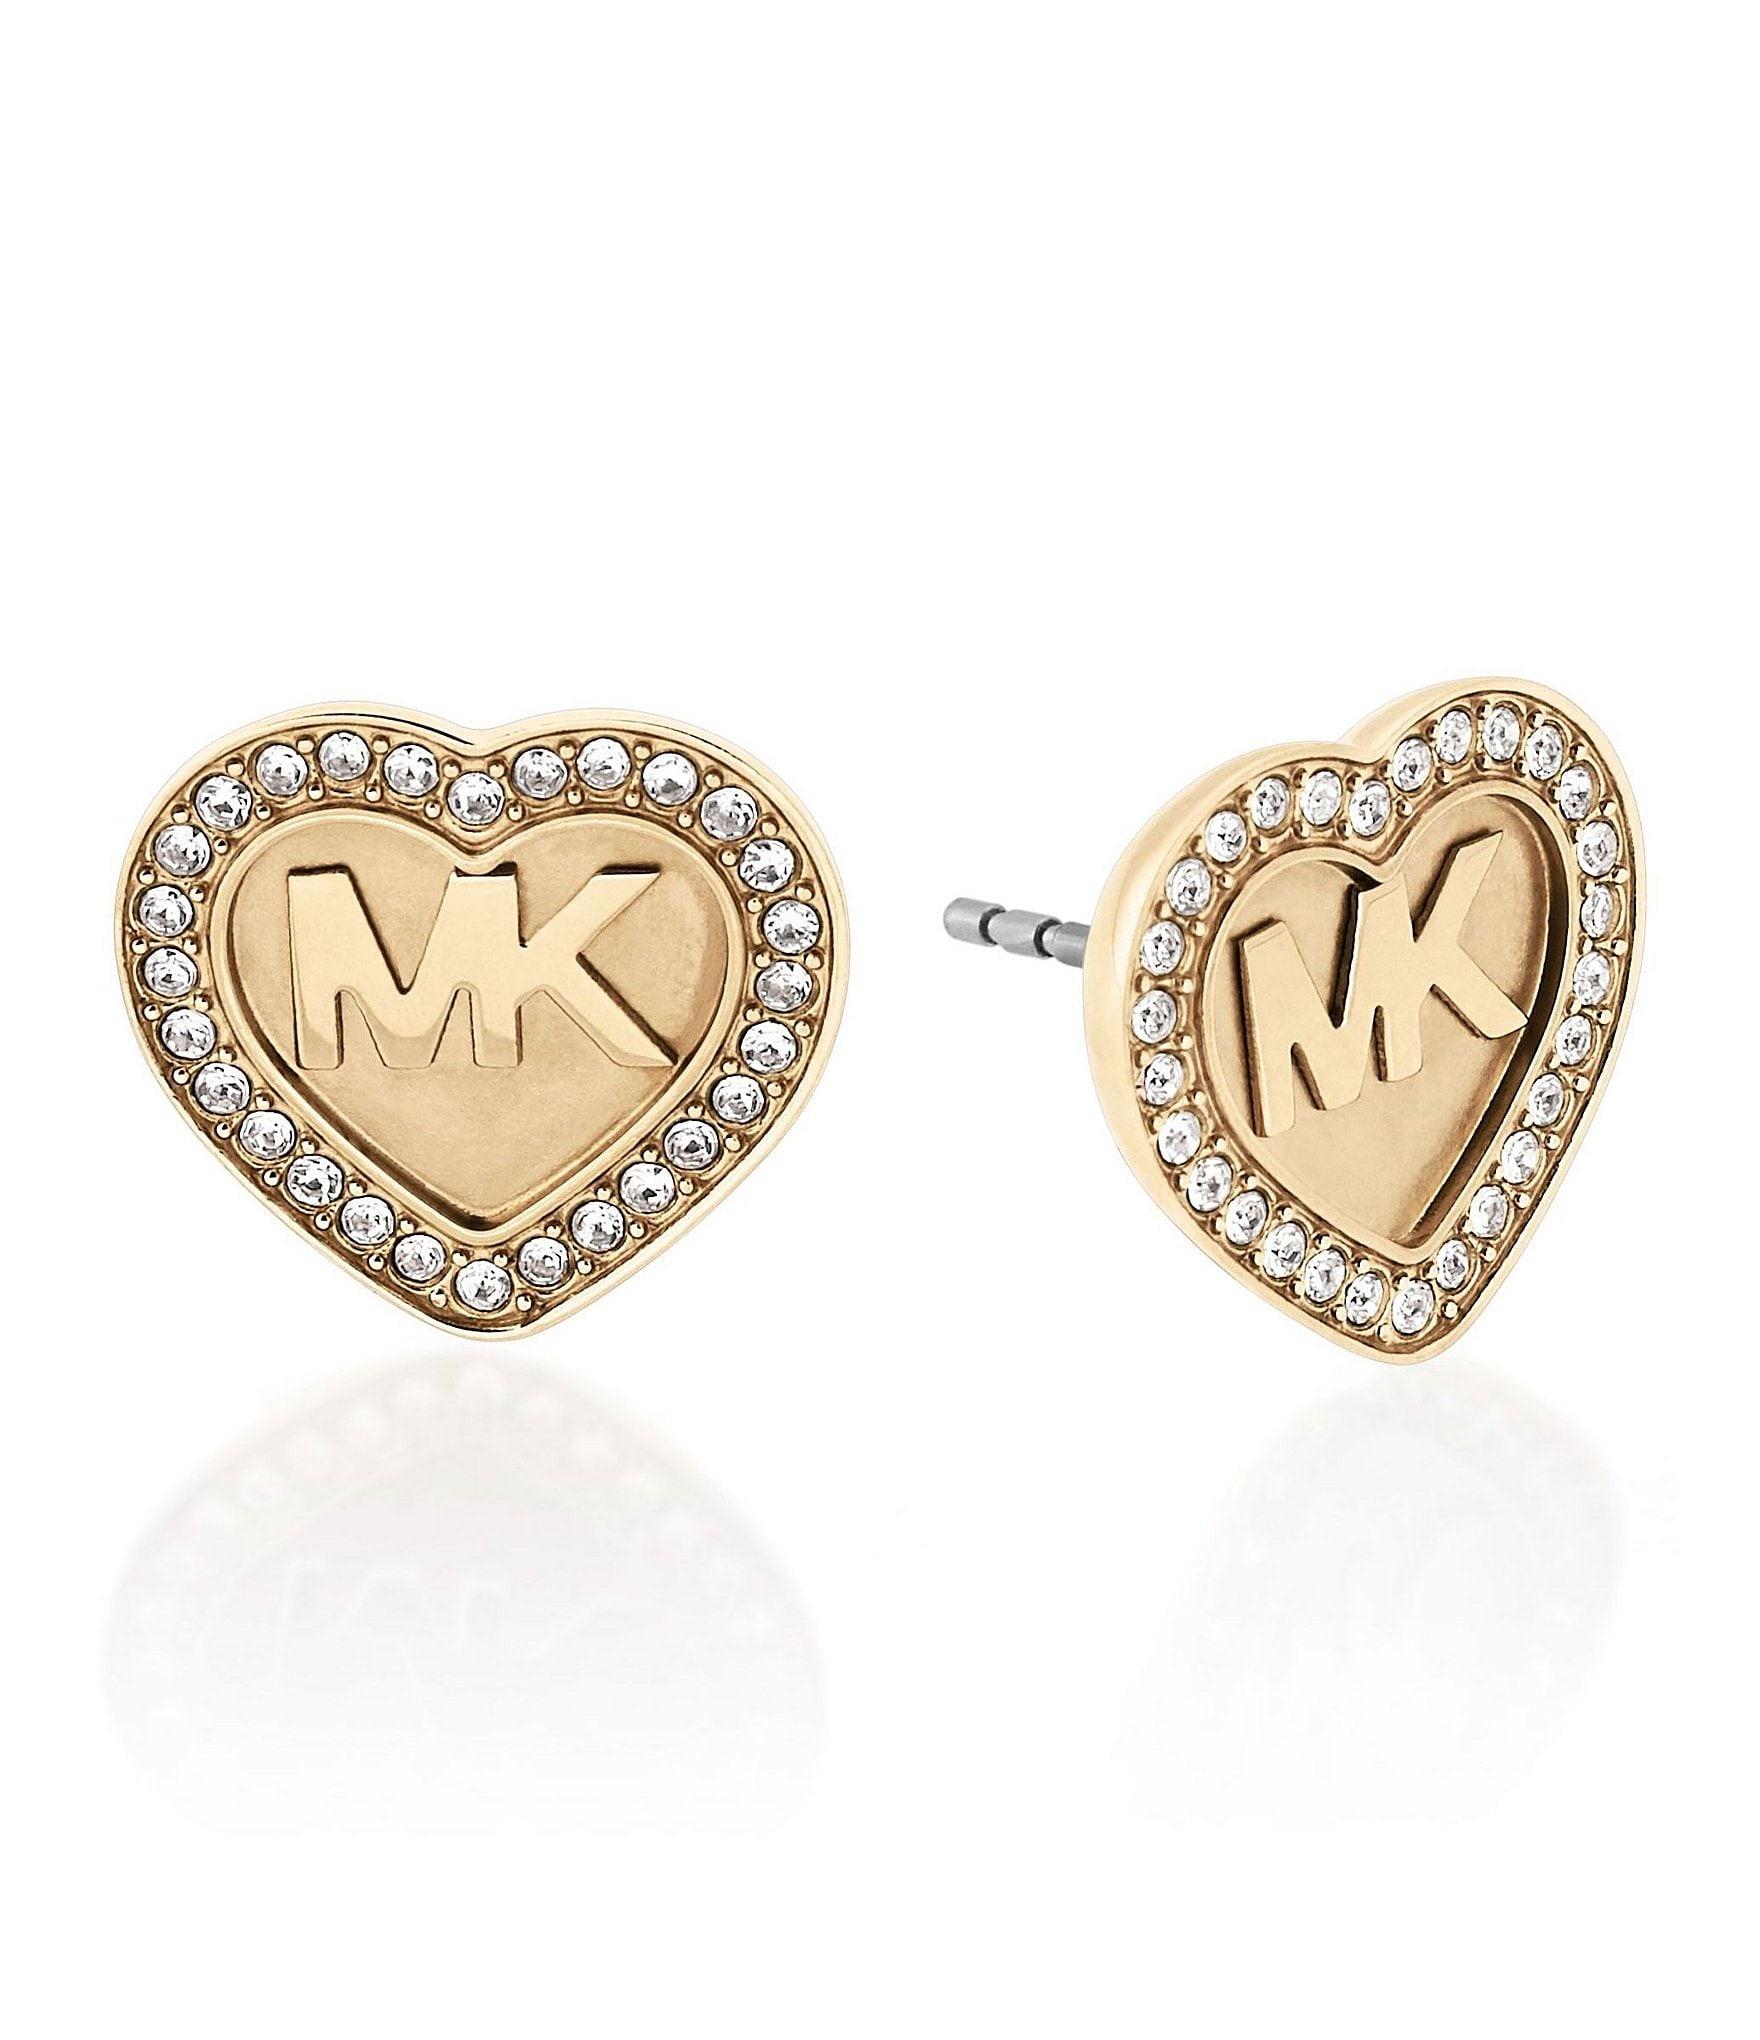 Diamond heart earrings - Diamond Heart Earrings 51